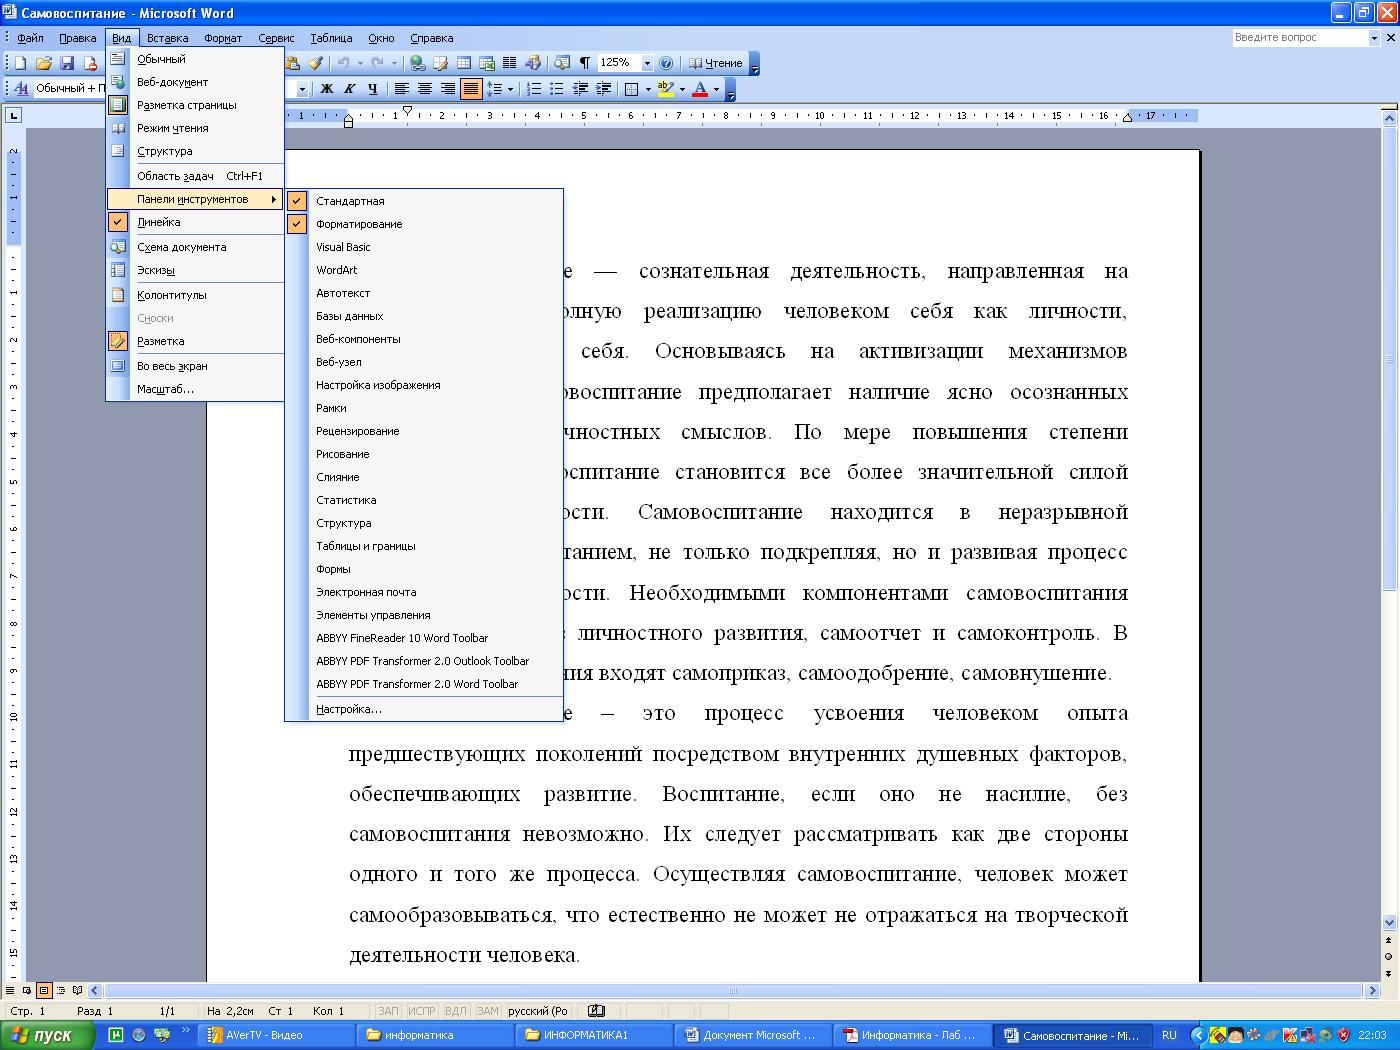 Страницы (текстовый процессор) - pages (word processor) - qwe.wiki